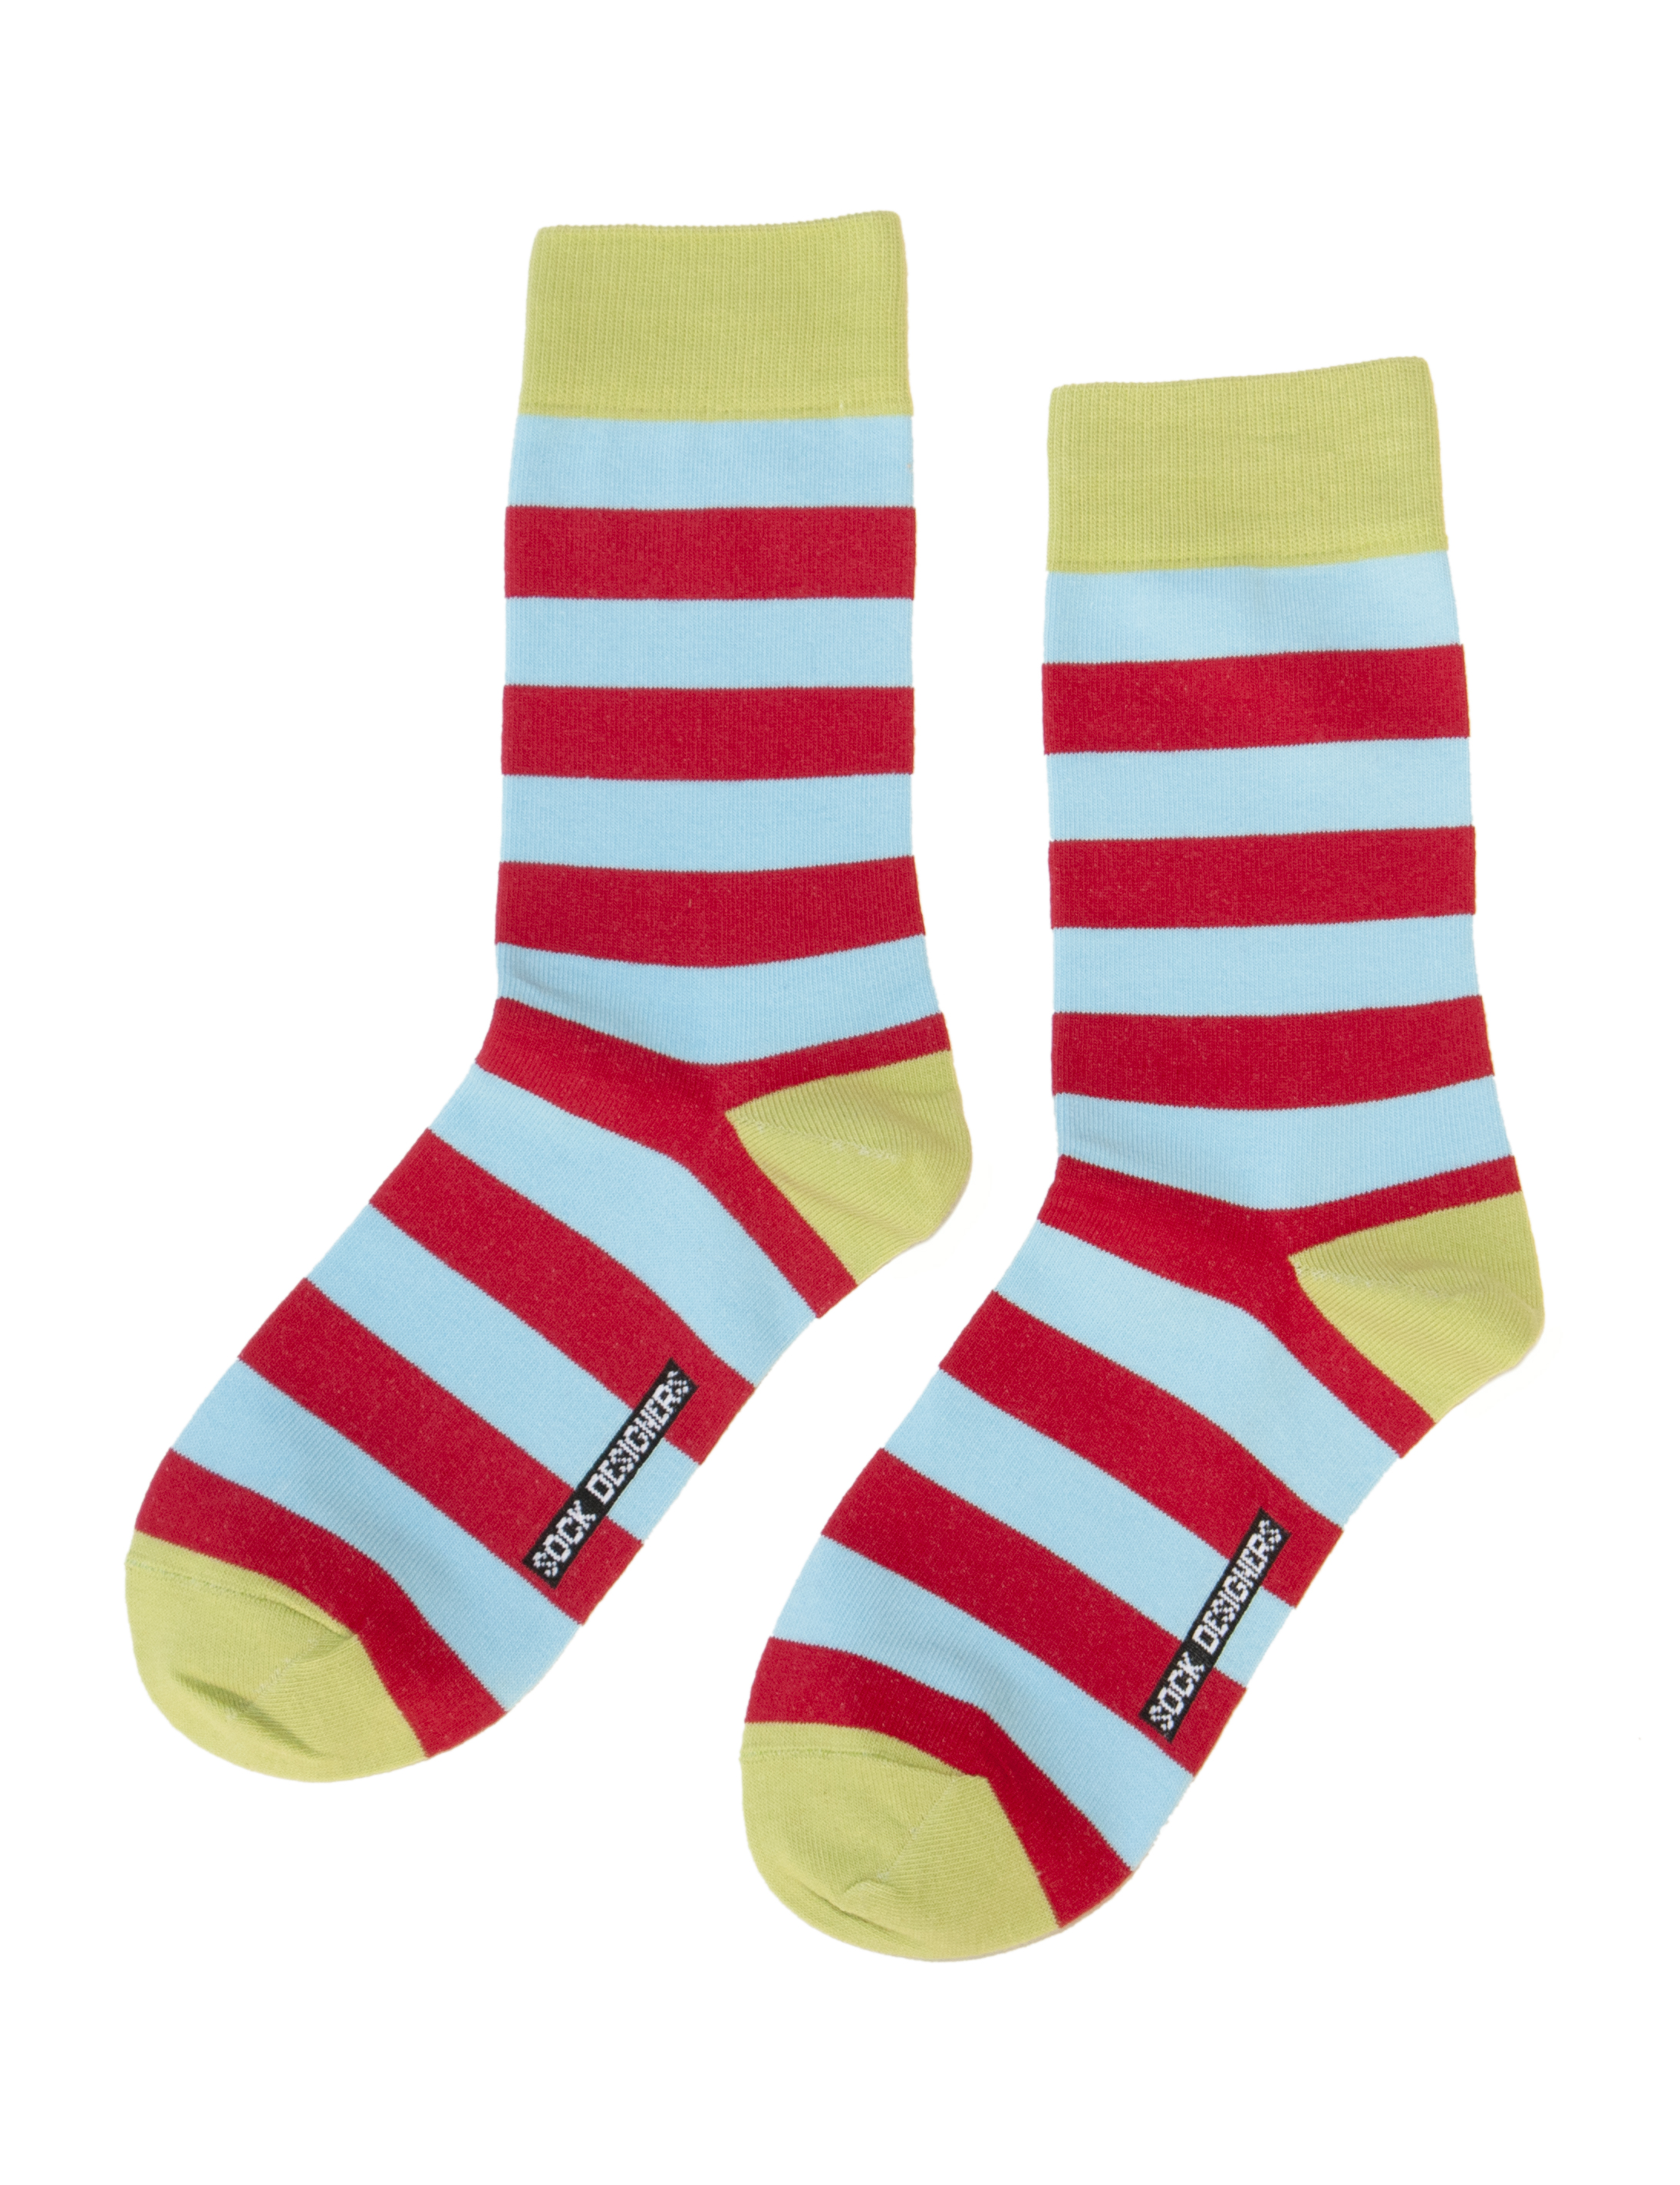 Socks Shoes Buy Online